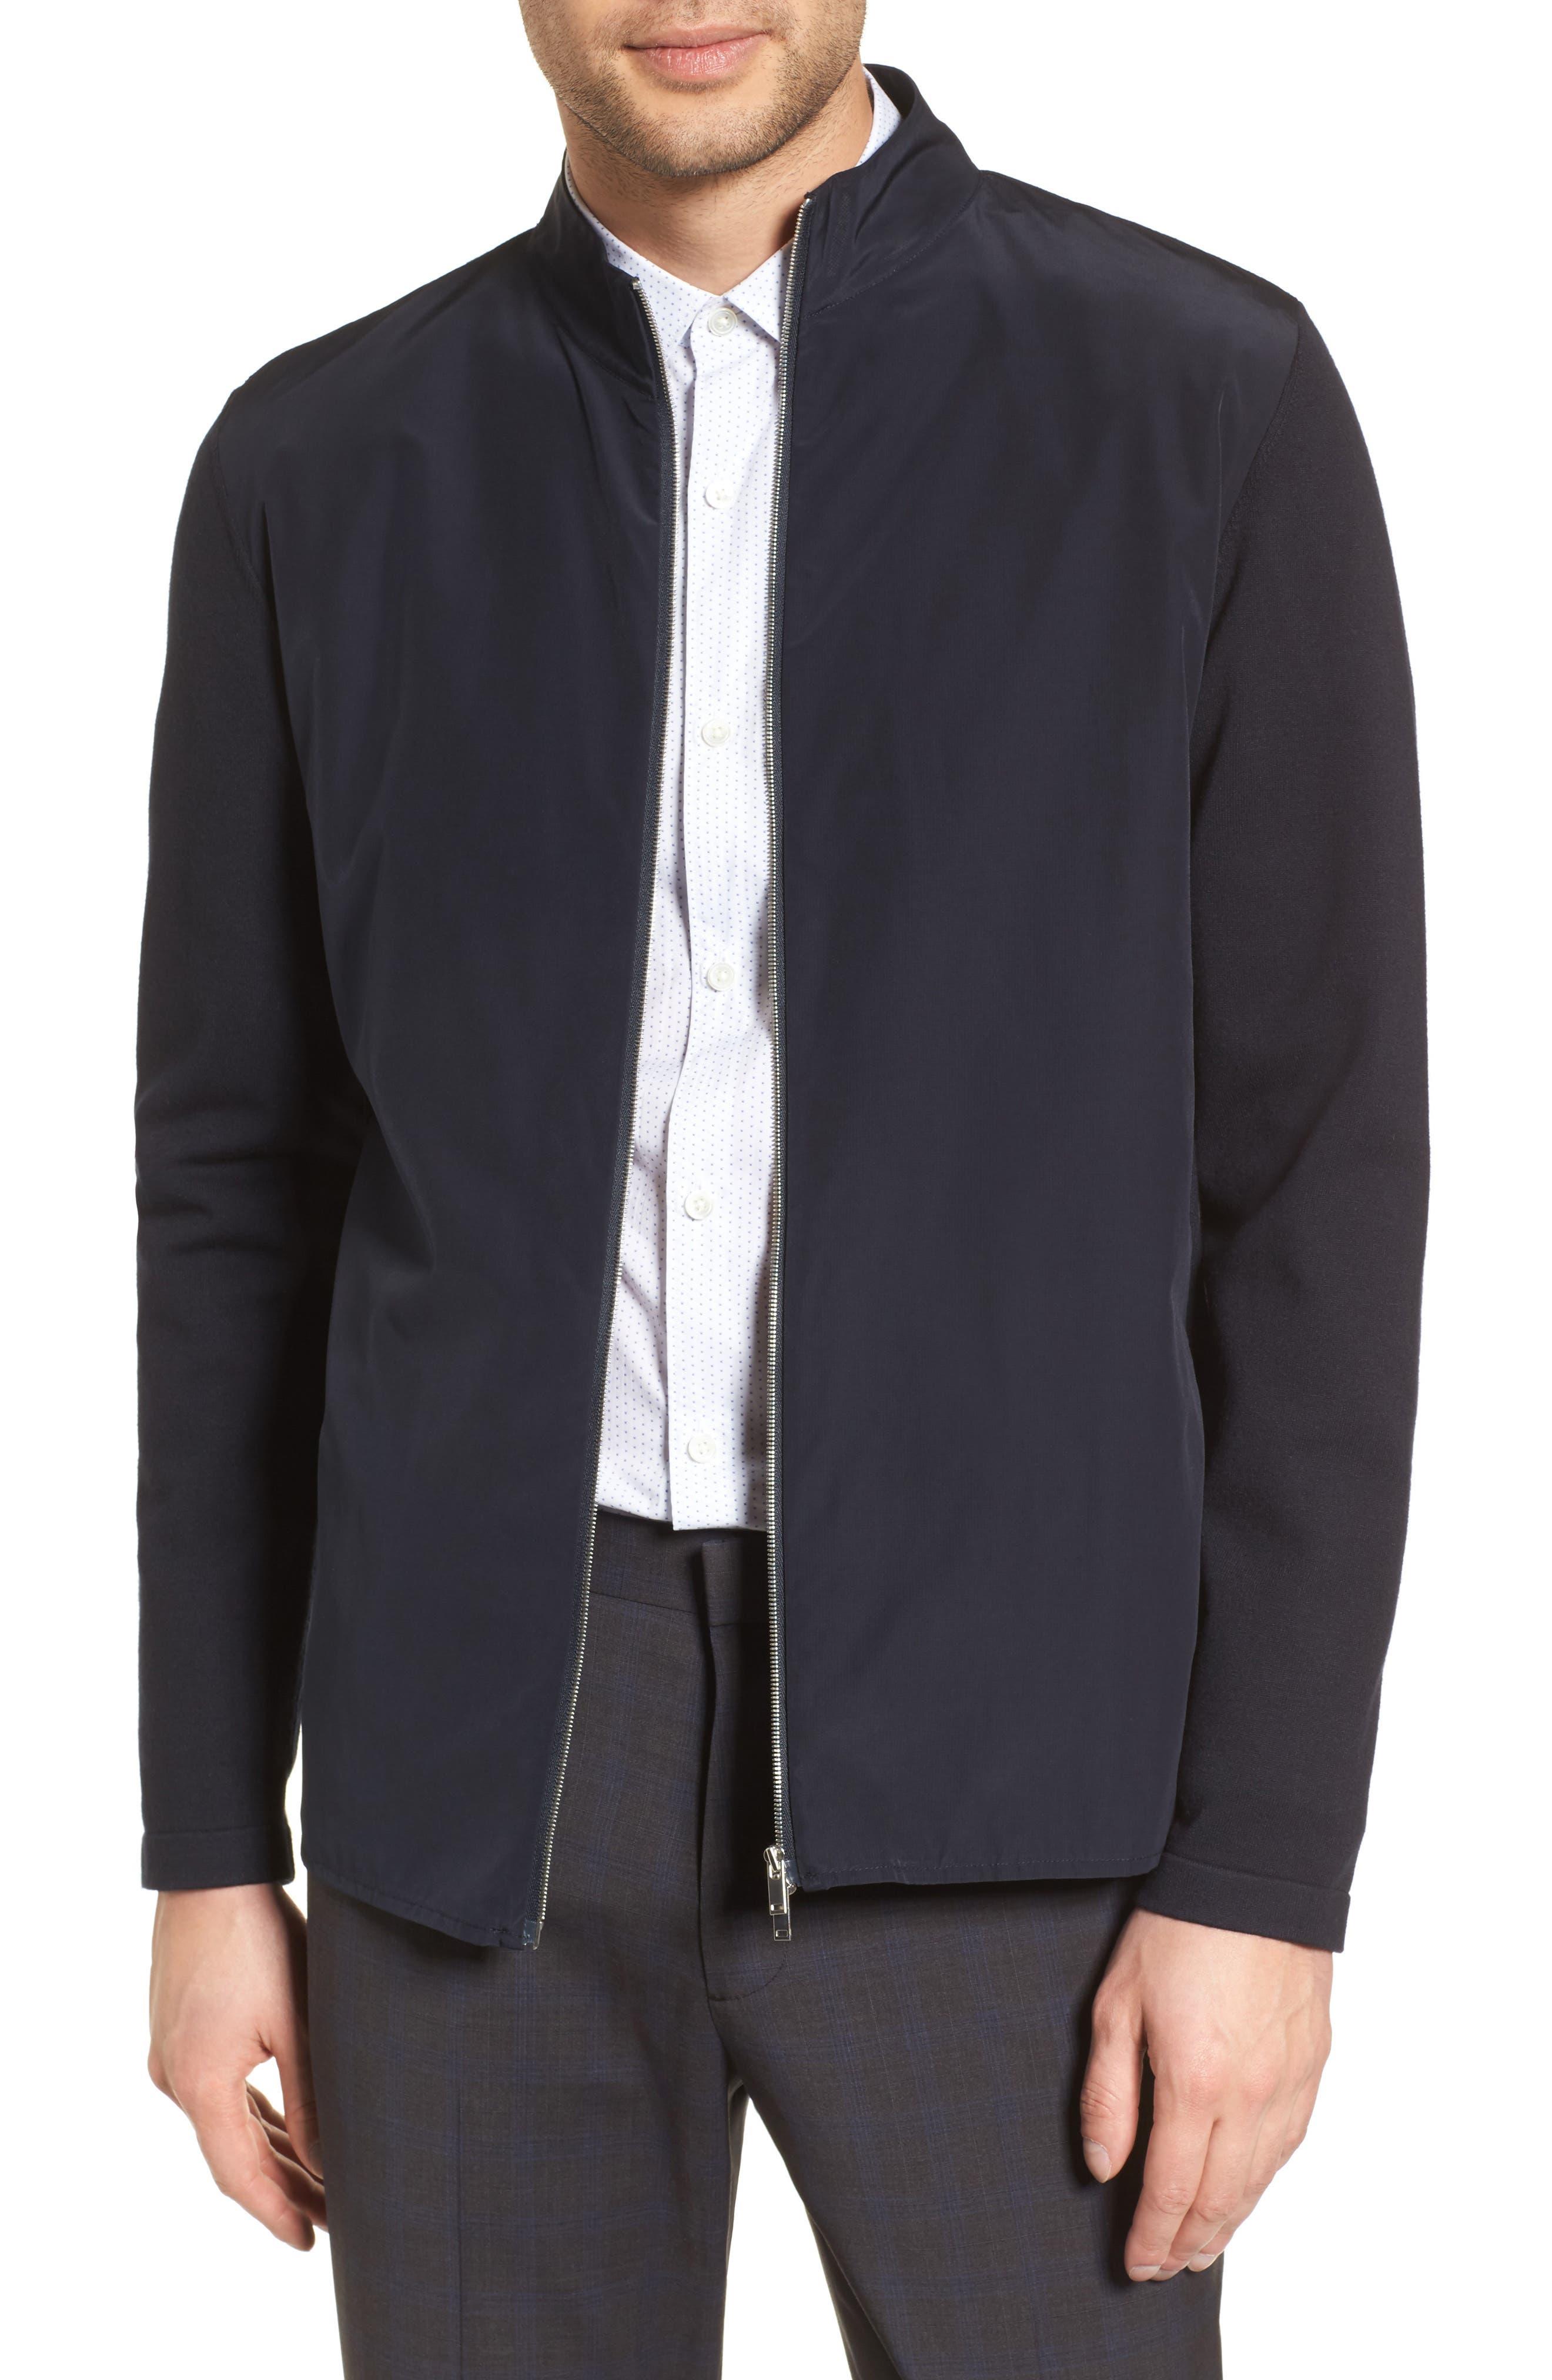 THEORY Bellvill PK Fine Bilen Jacket, Main, color, ECLIPSE MULTI